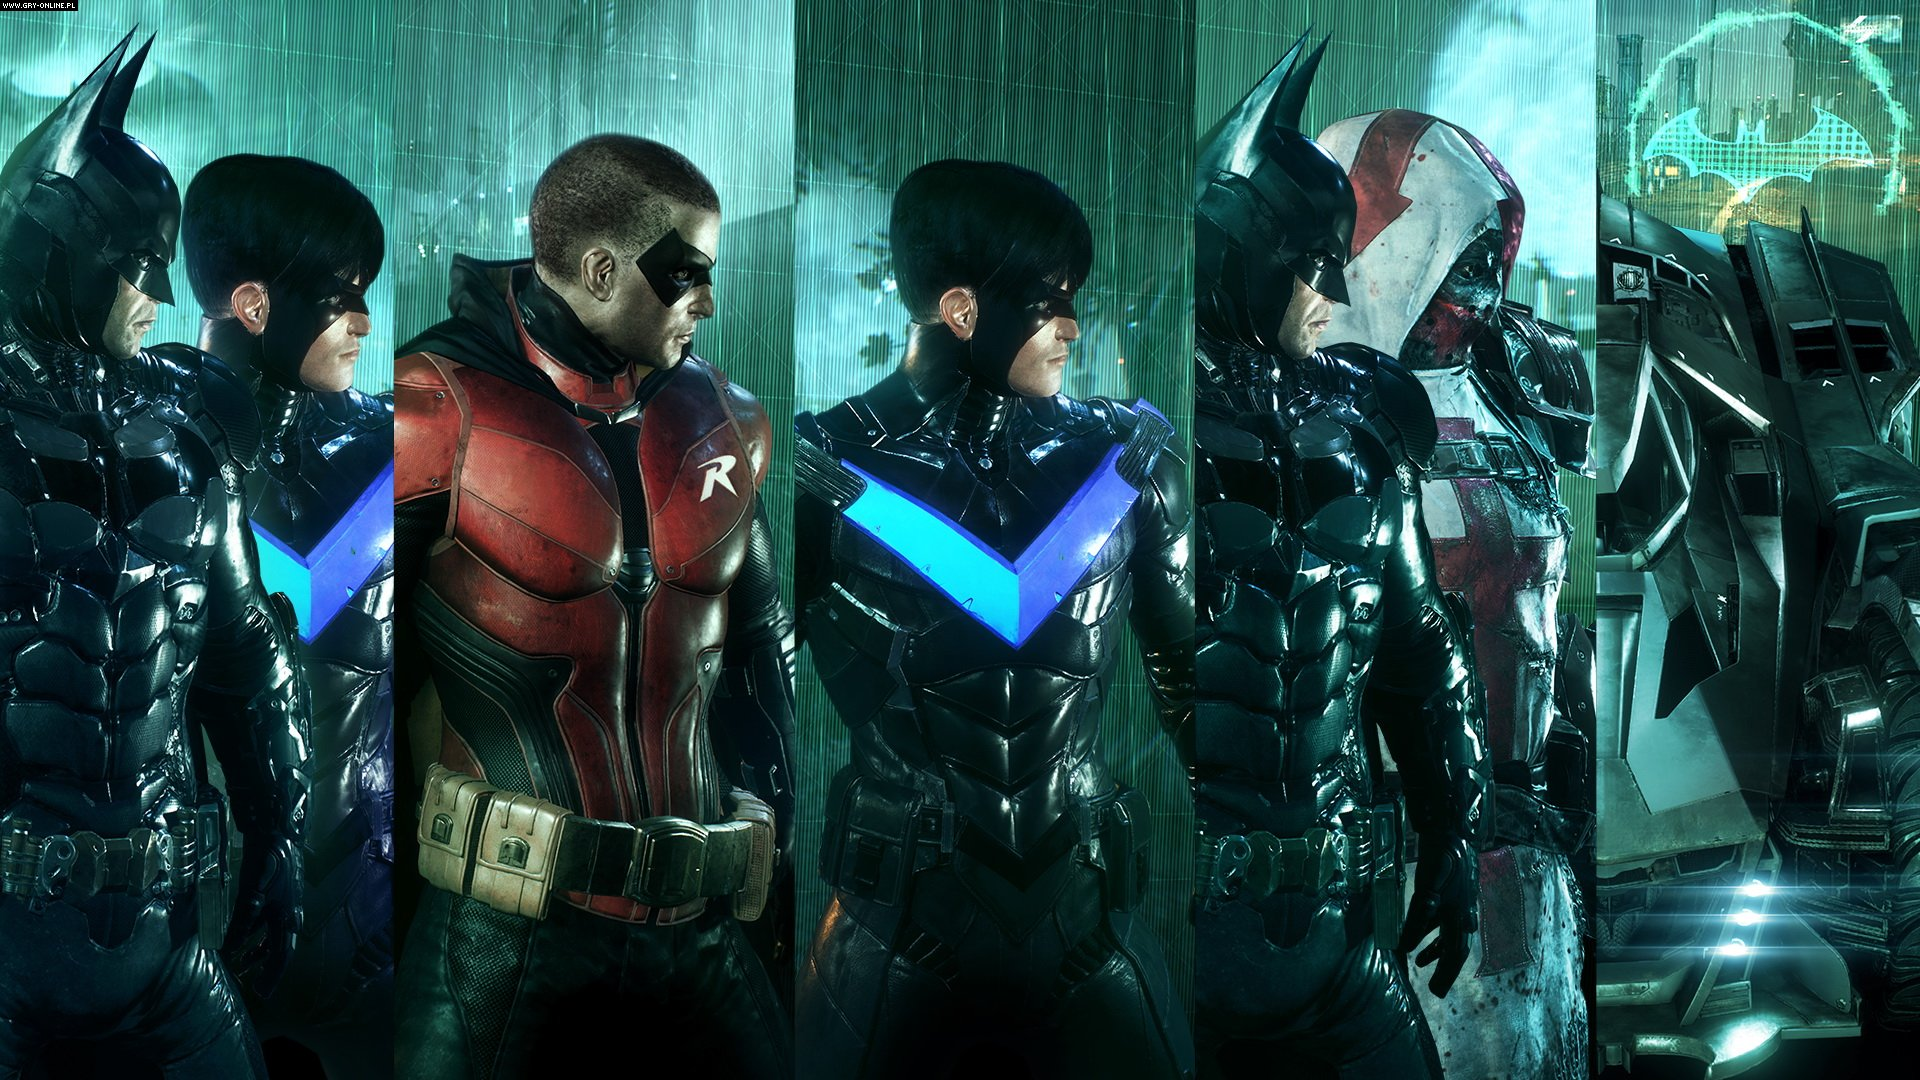 Batman: Arkham Knight PC, PS4, XONE Games Image 2/63, RockSteady Studios, Warner Bros Interactive Entertainment